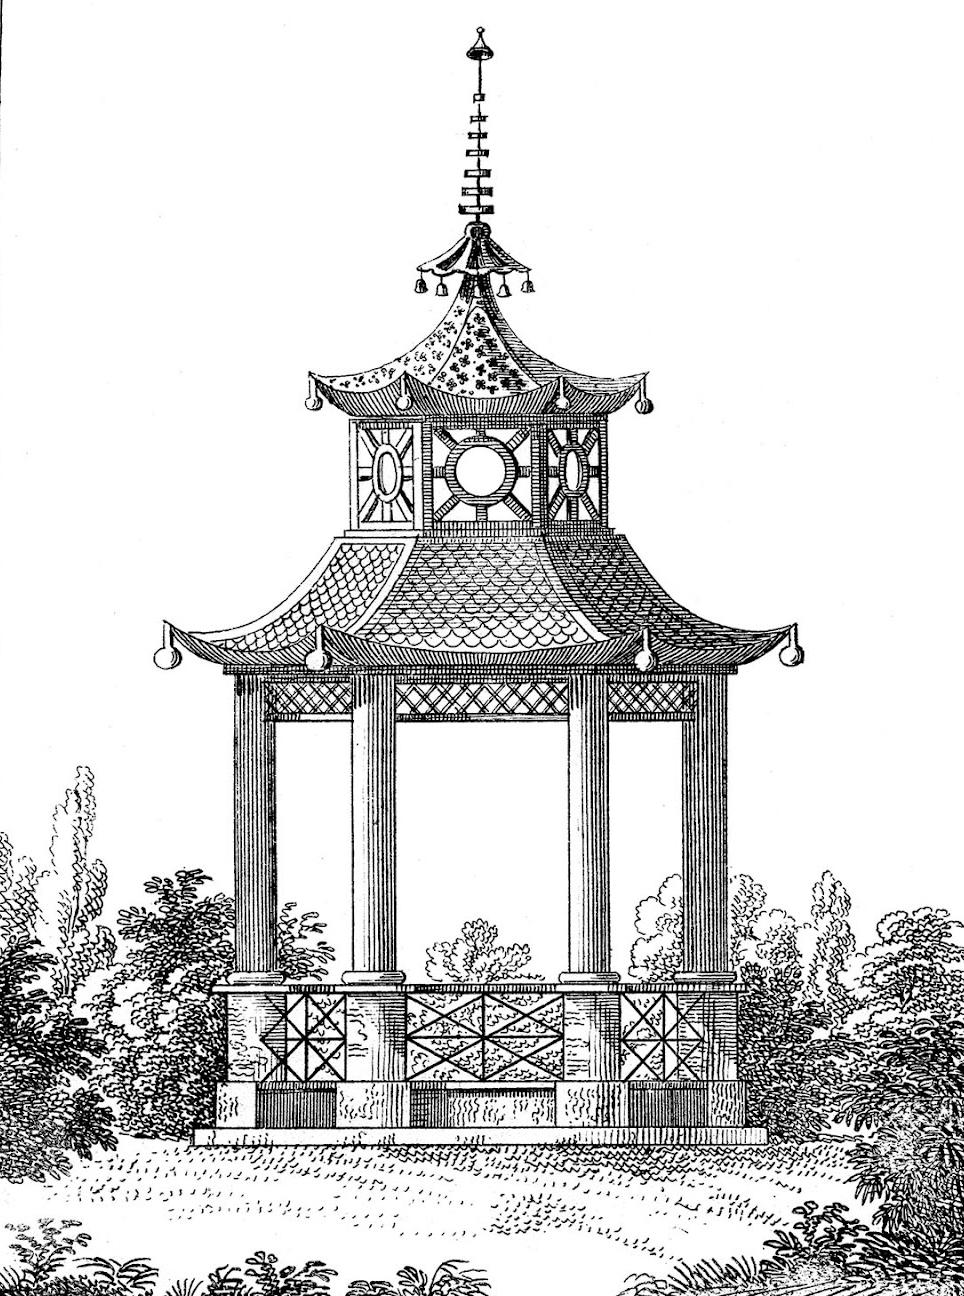 Garden-Pagoda-GraphicsFairy-bwsm.jpg